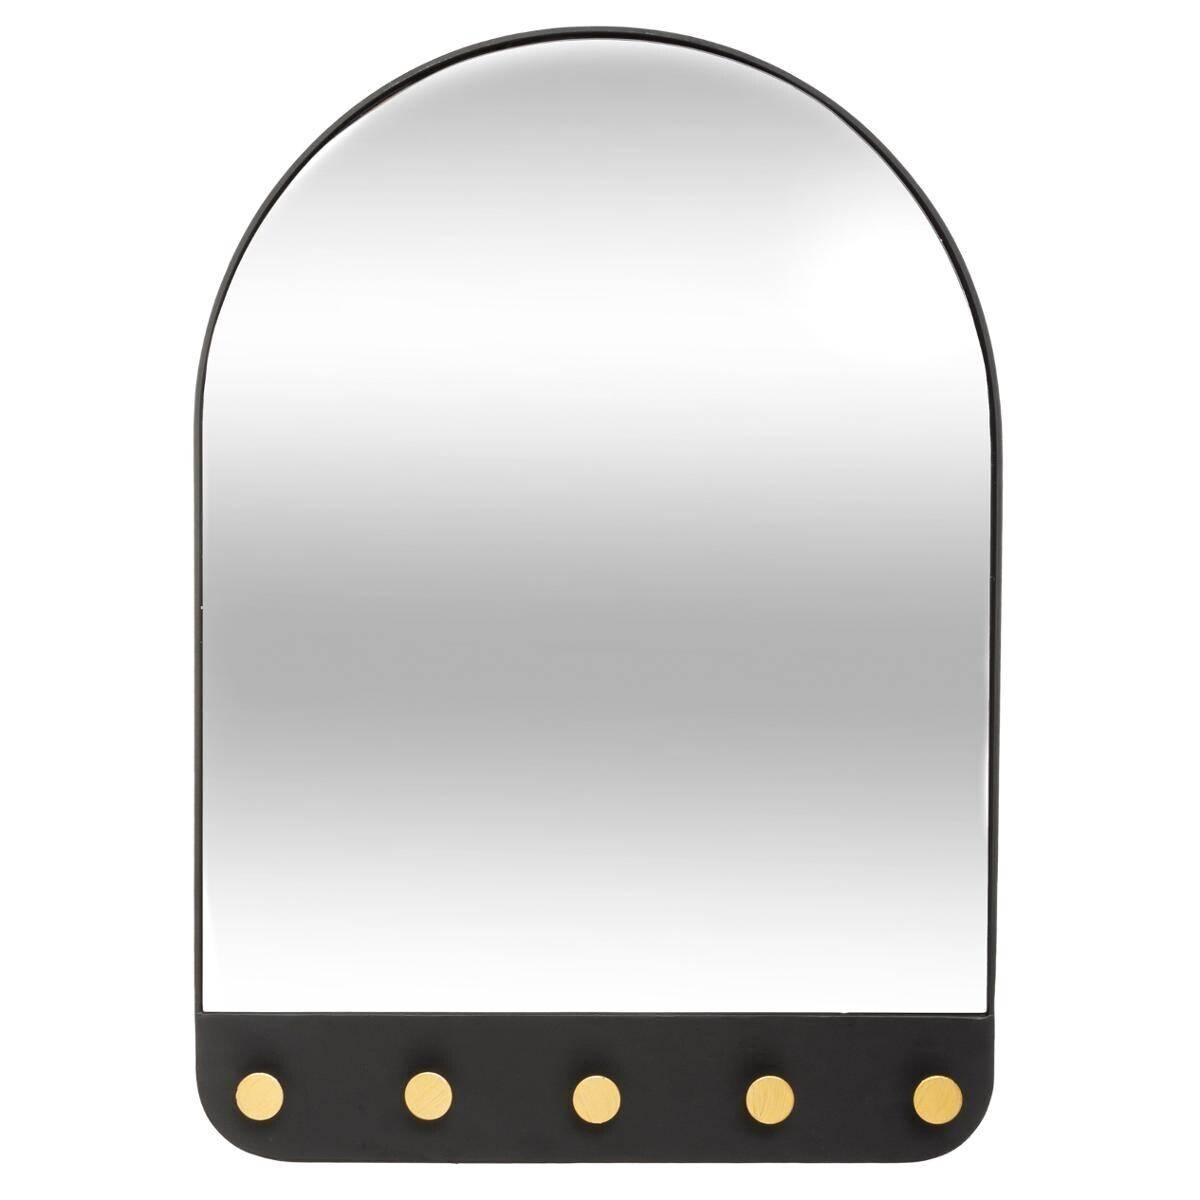 Atmosphera Miroir 5 patères, métal 51x71 cm